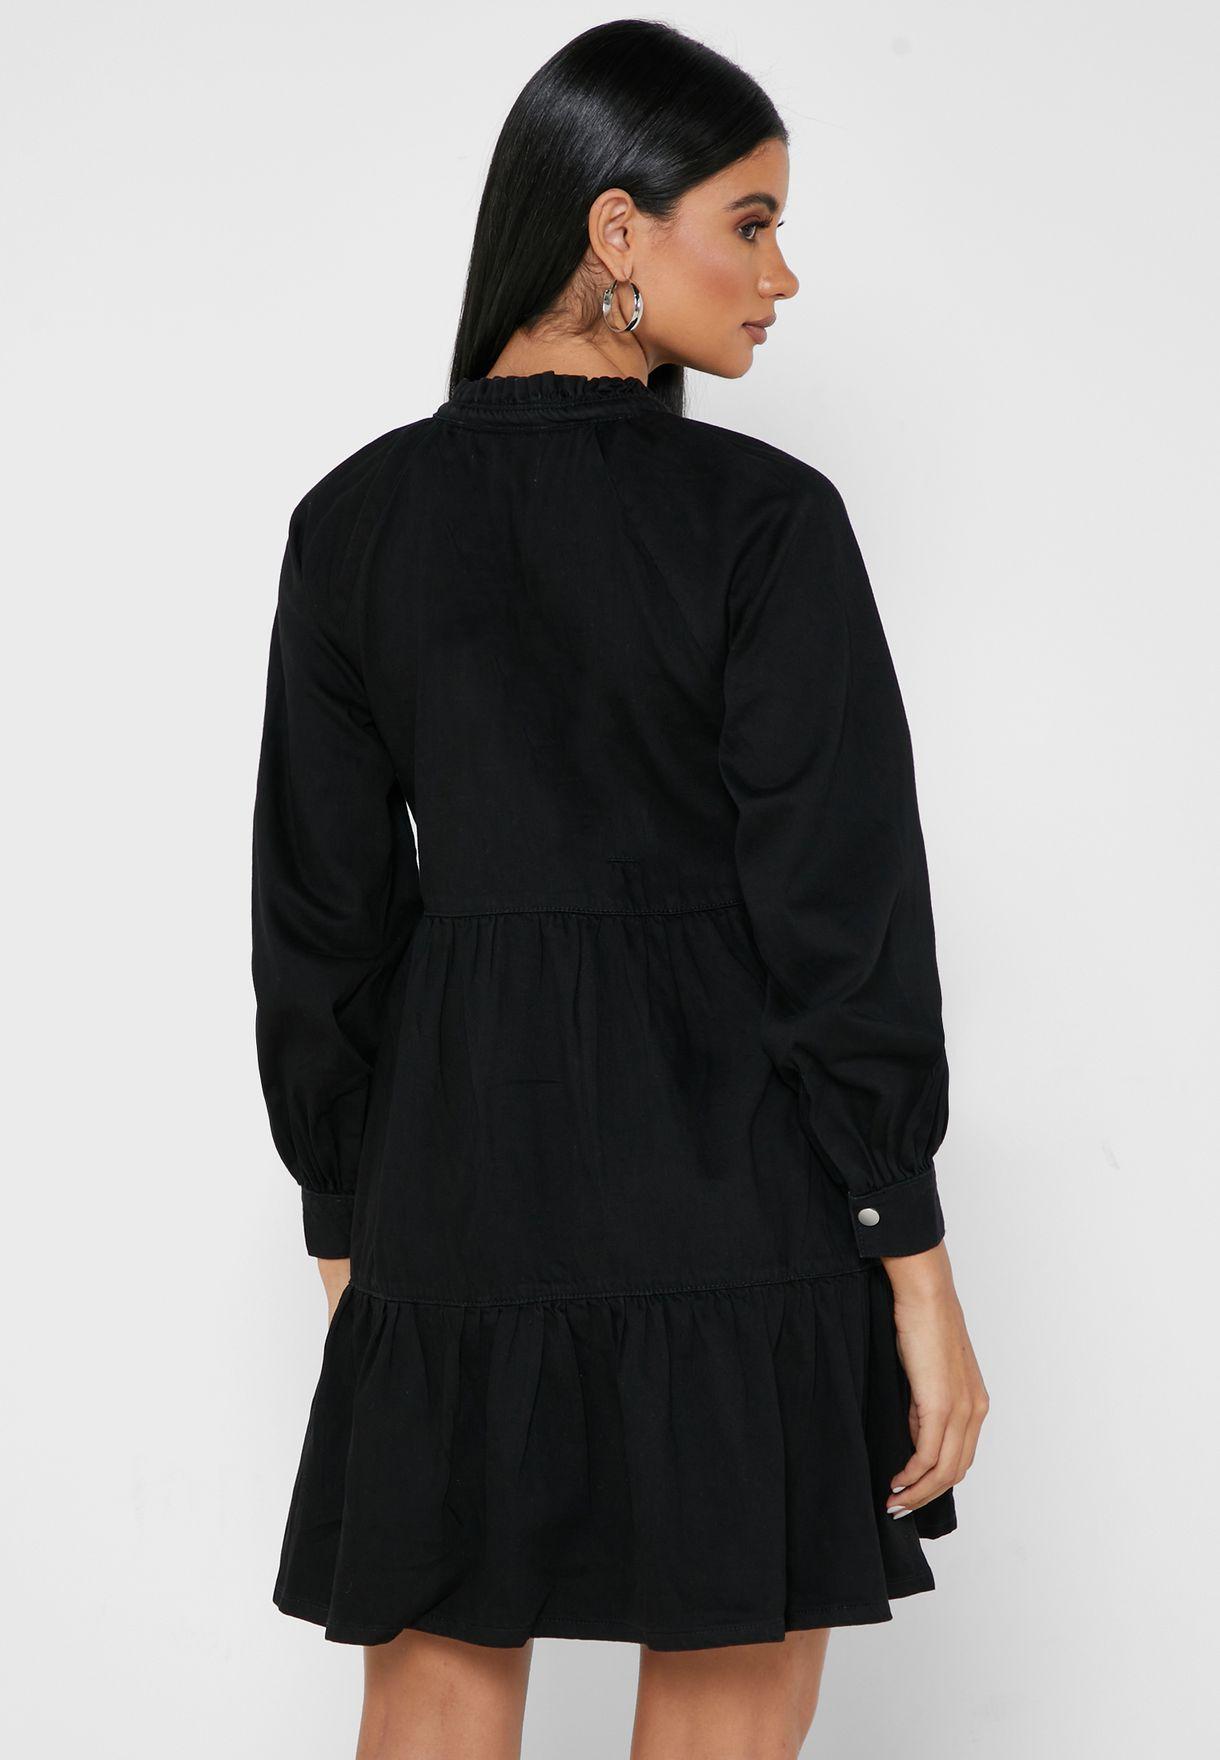 Tiered Hem Denim Dress